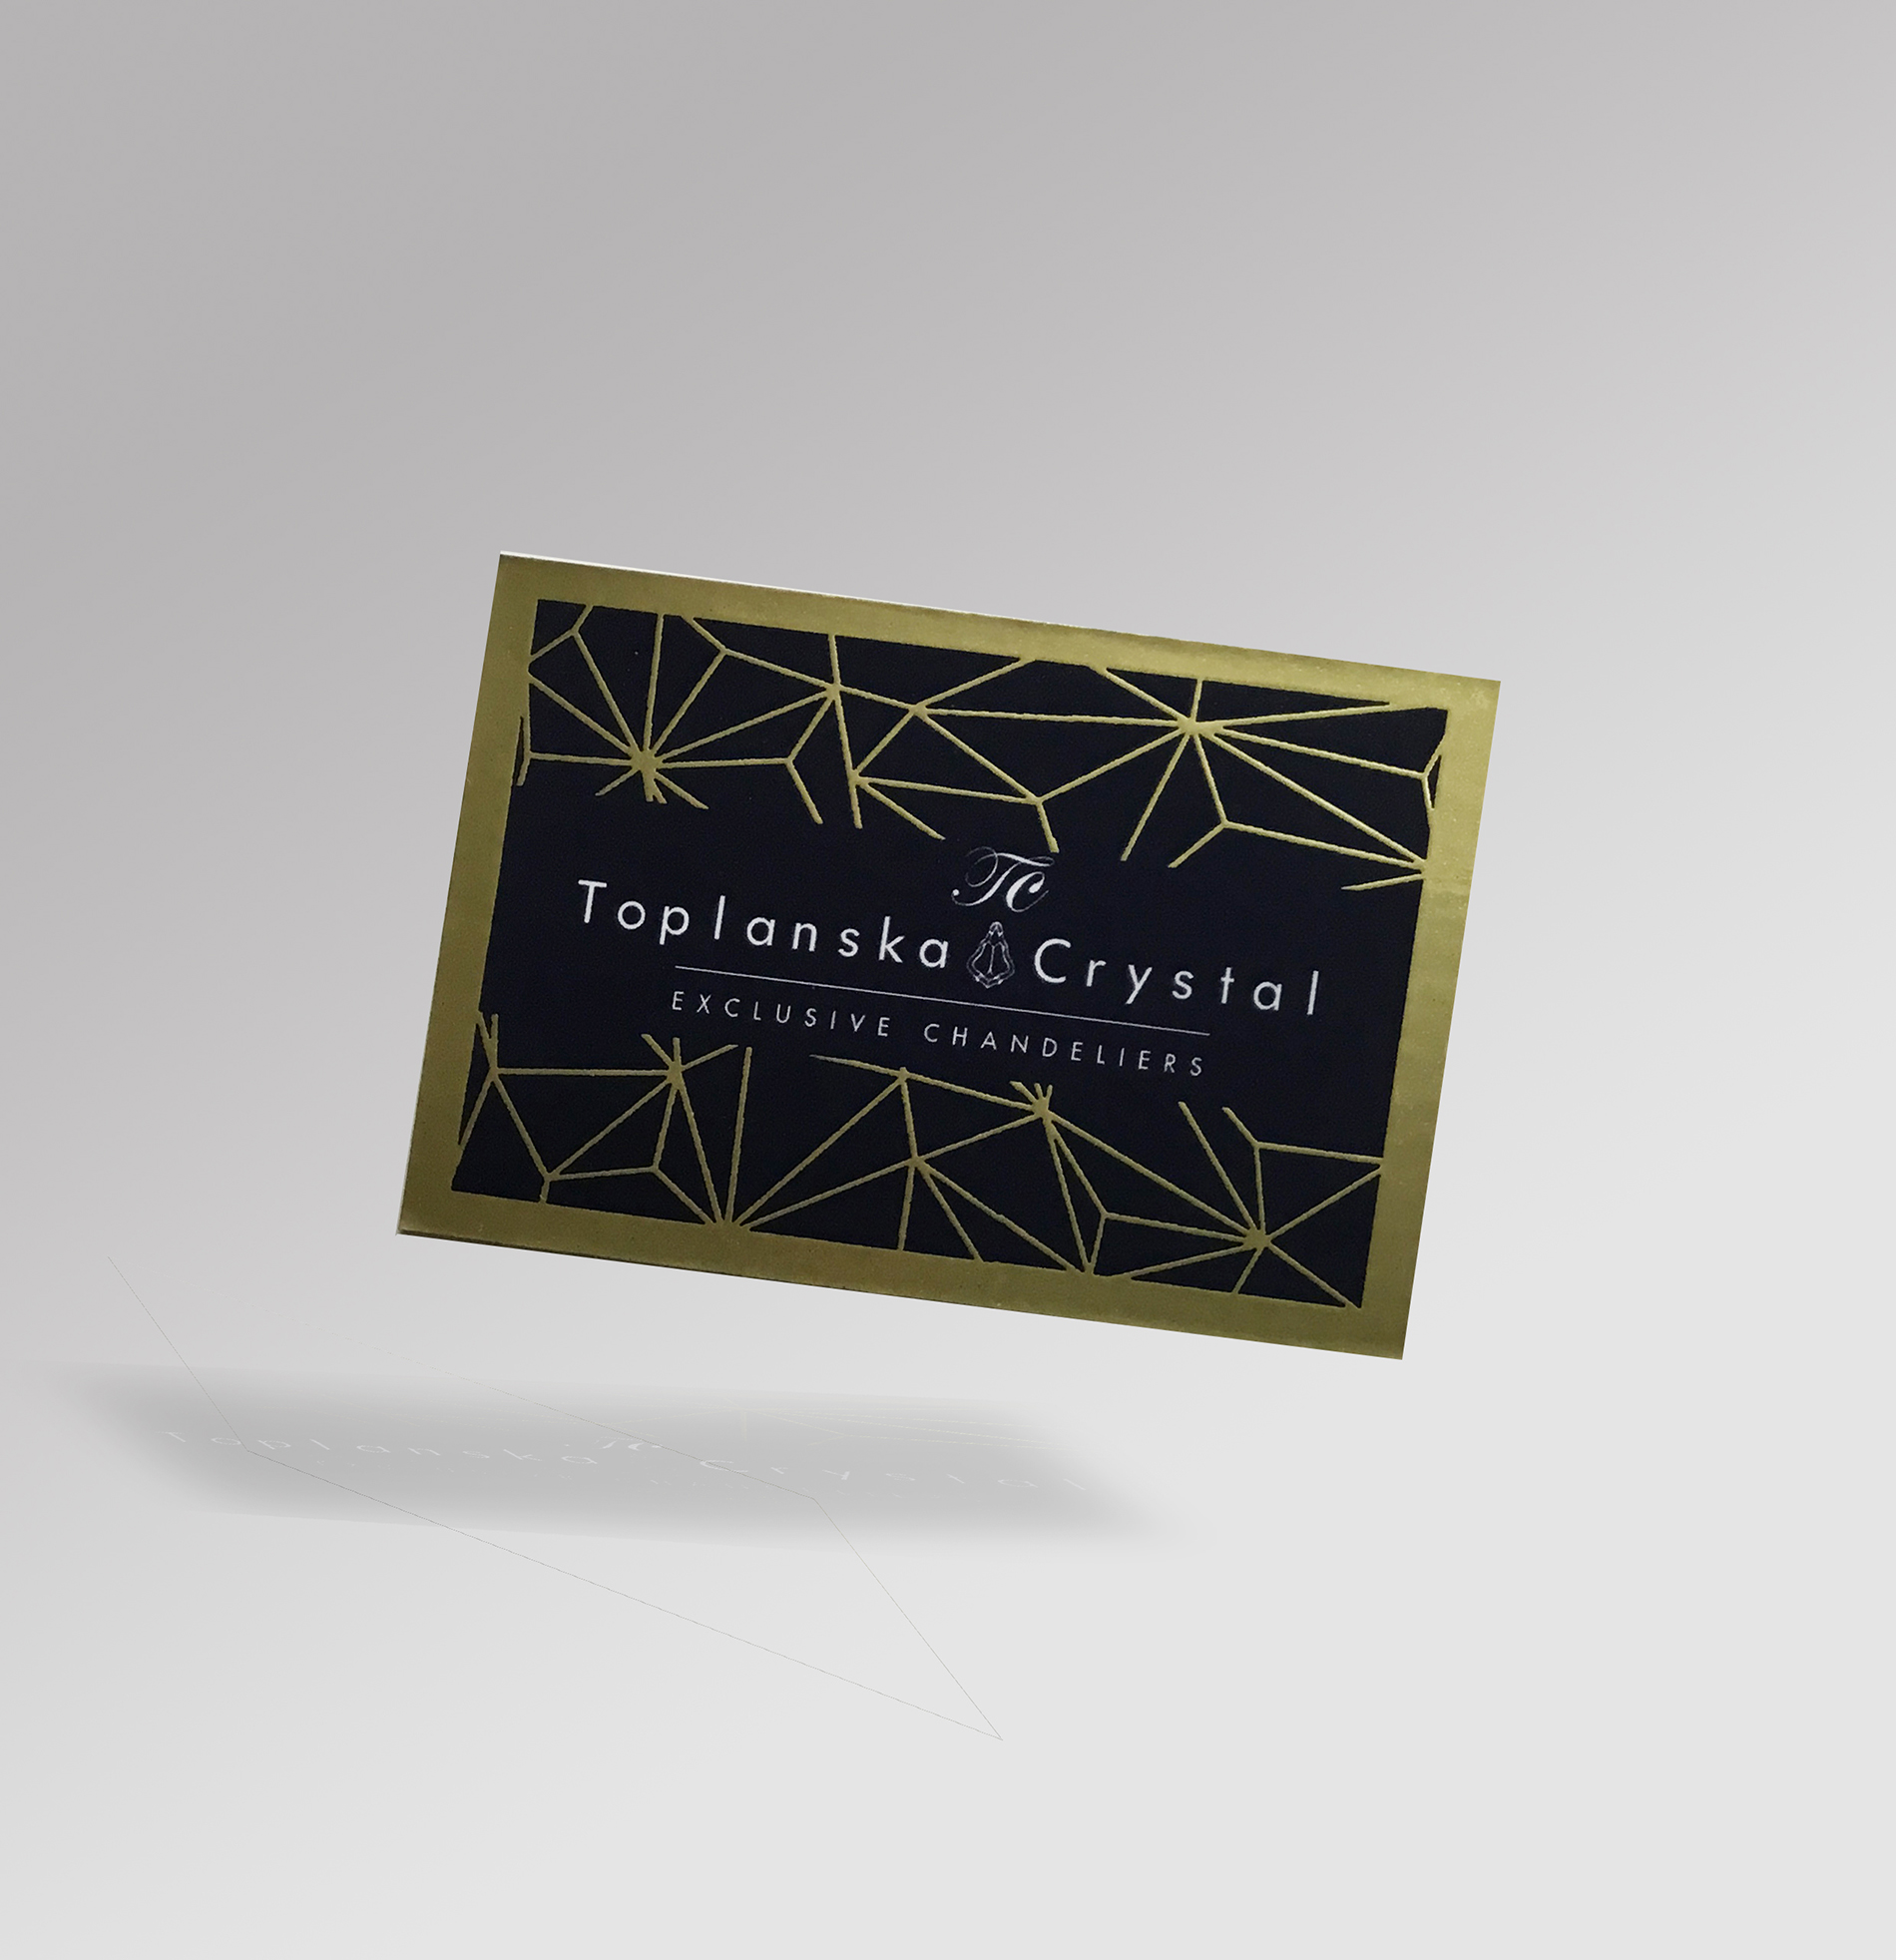 carte de visite Toplanska